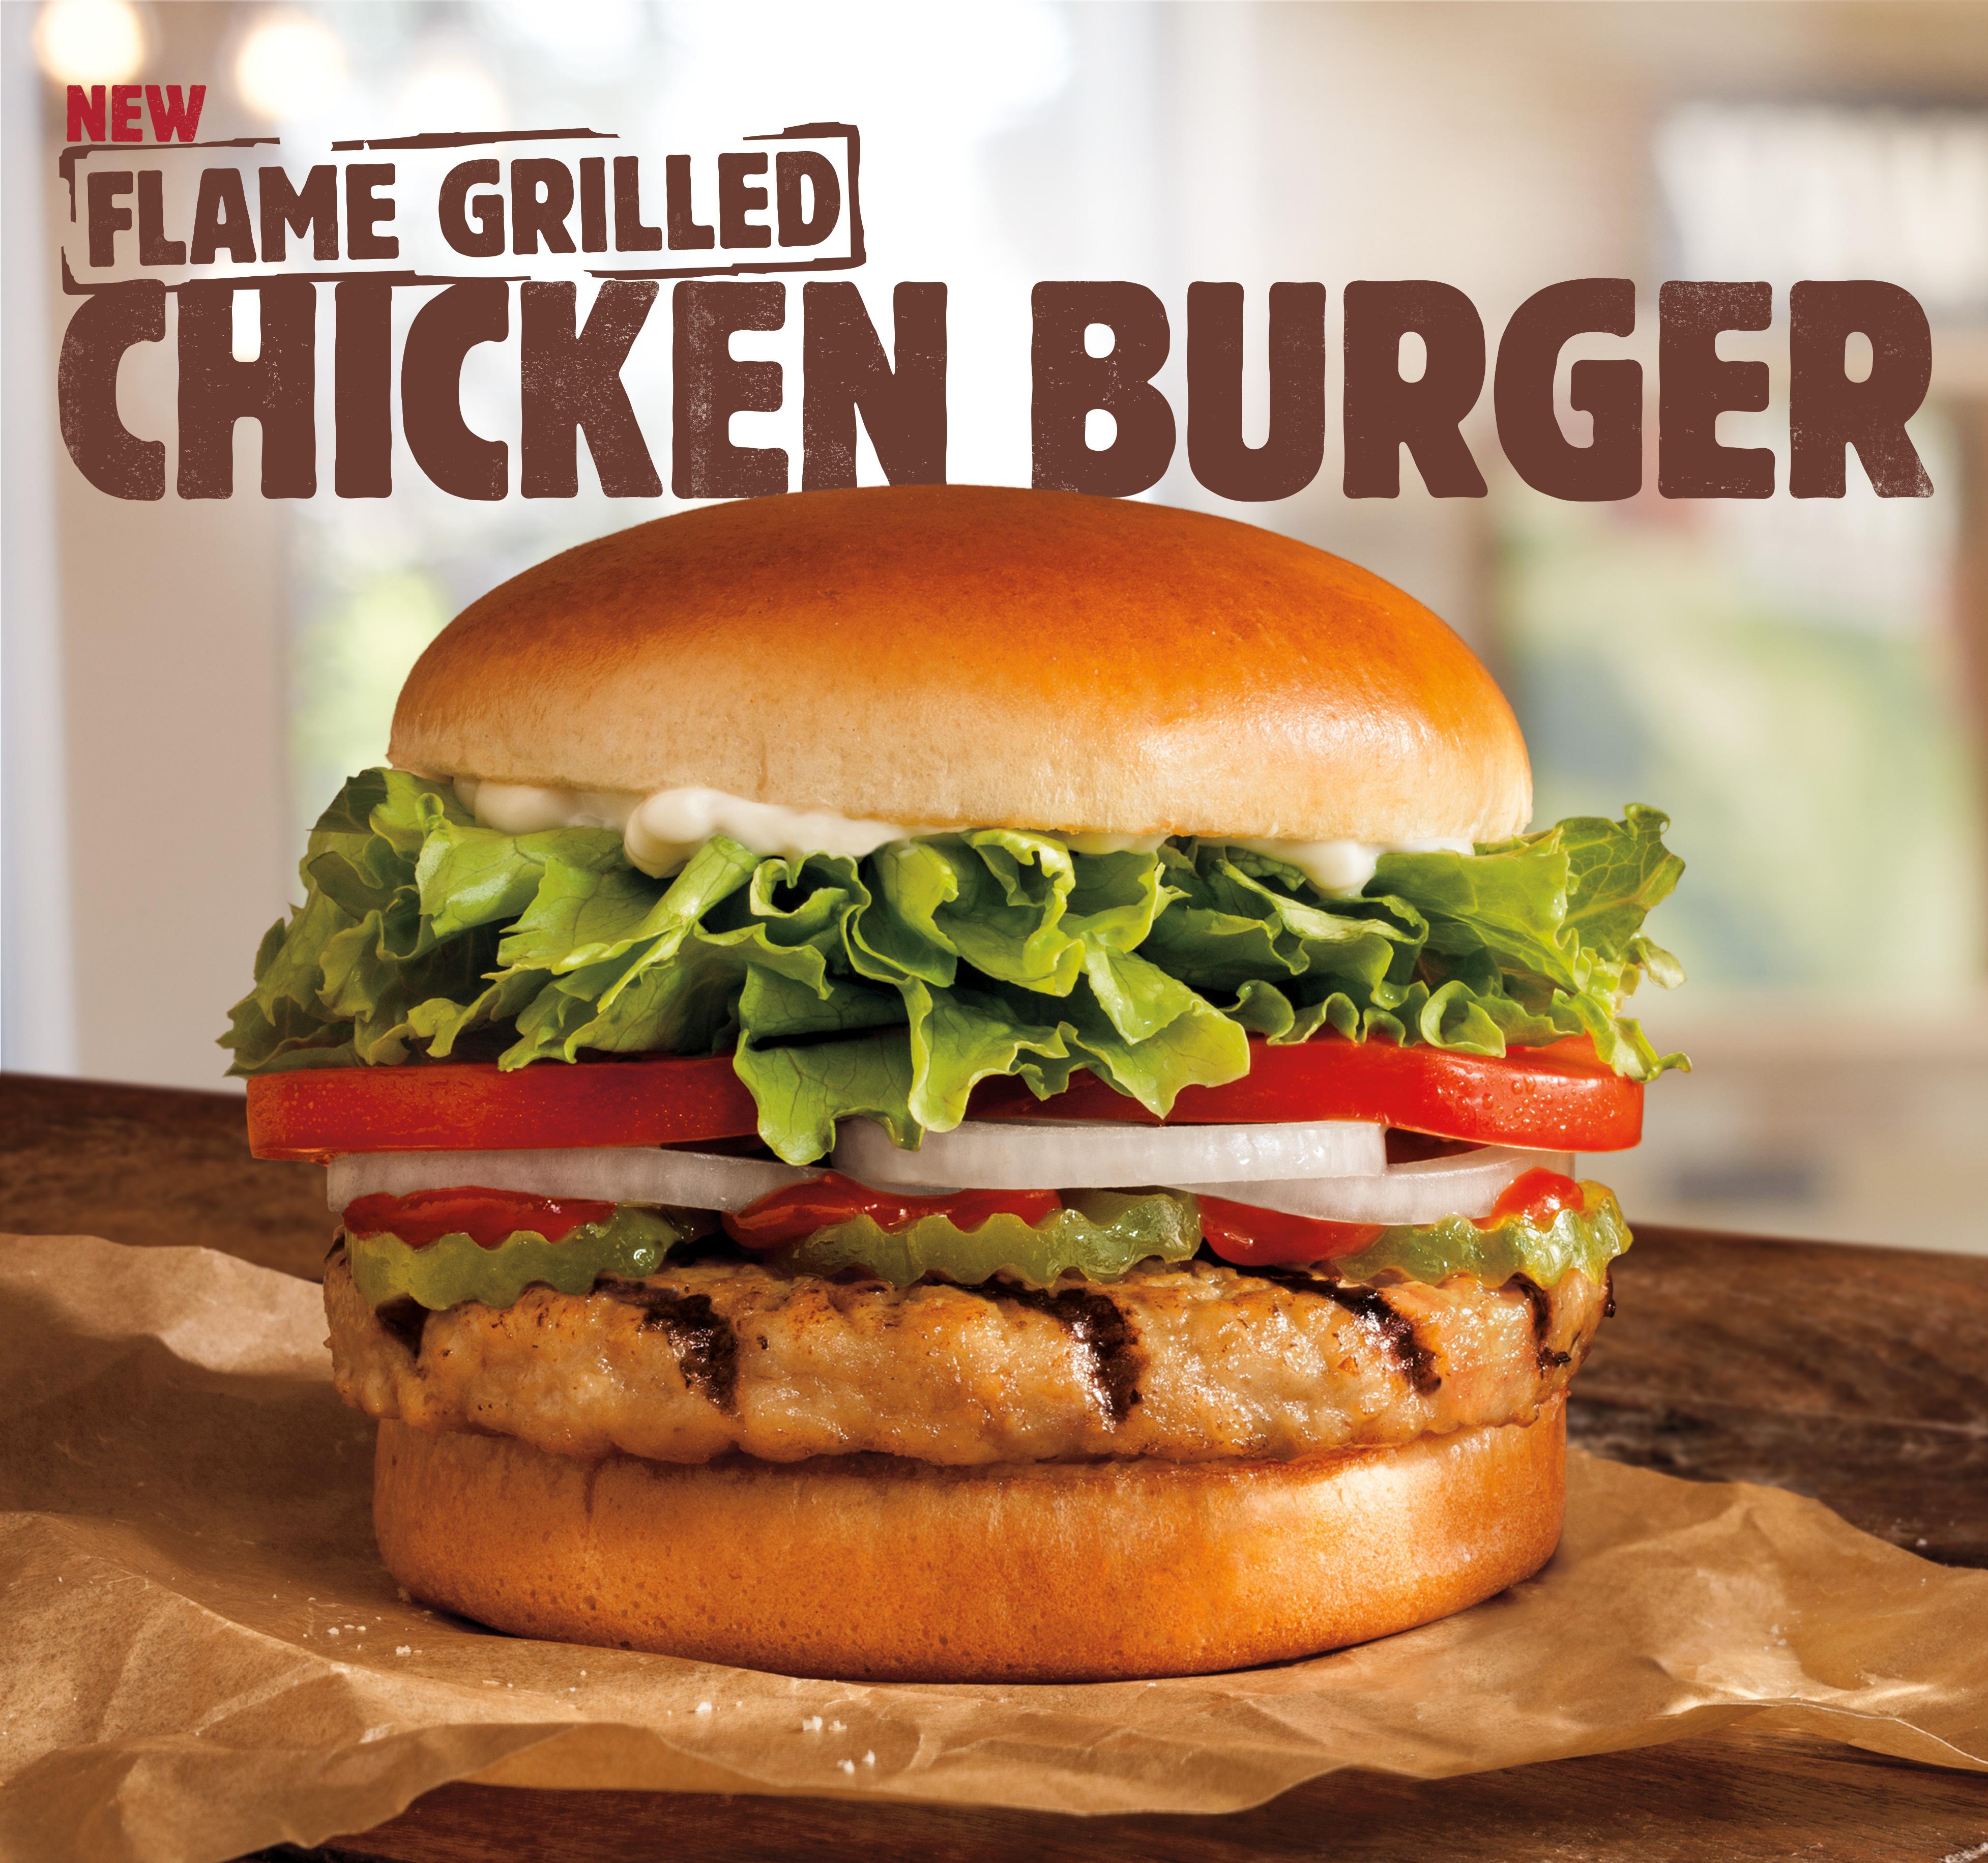 Burger King Restaurants Introduce Flame Grilled Chicken Burger